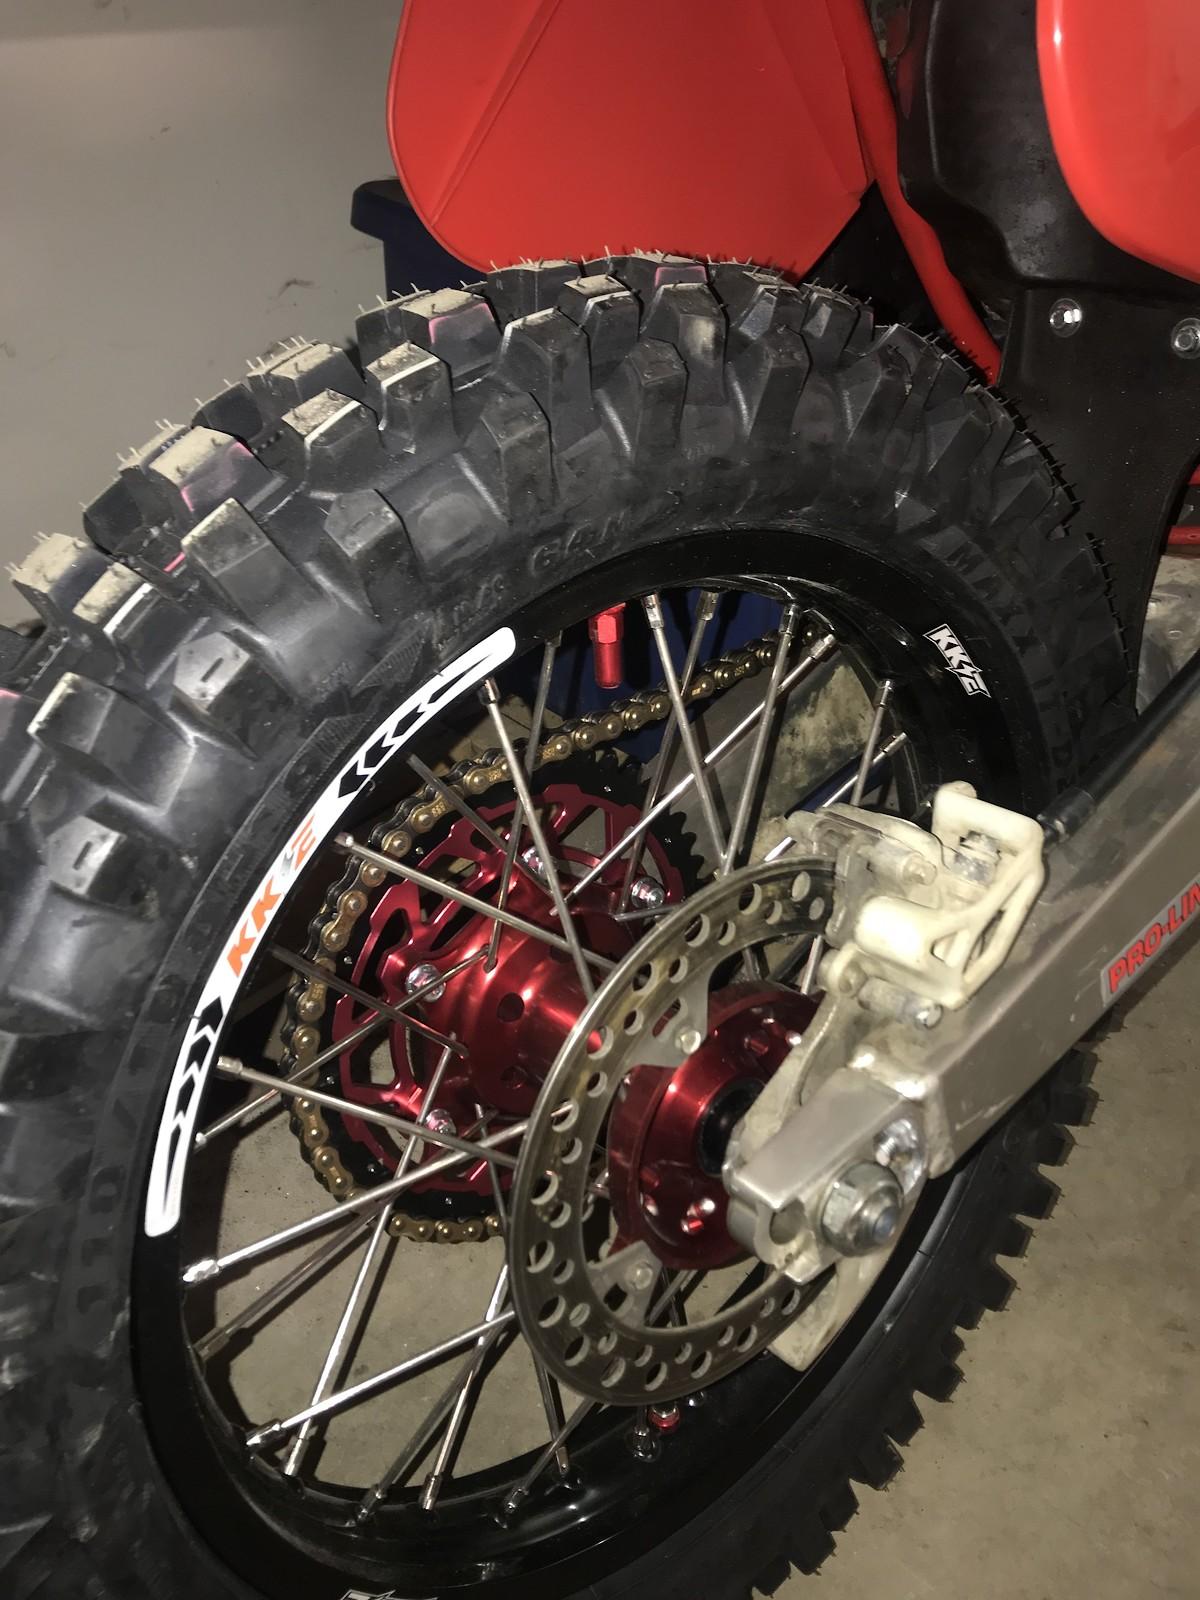 8543A6B3-9B29-4FE8-AA7D-24998E1B1775 - NateWeltzin - Motocross Pictures - Vital MX